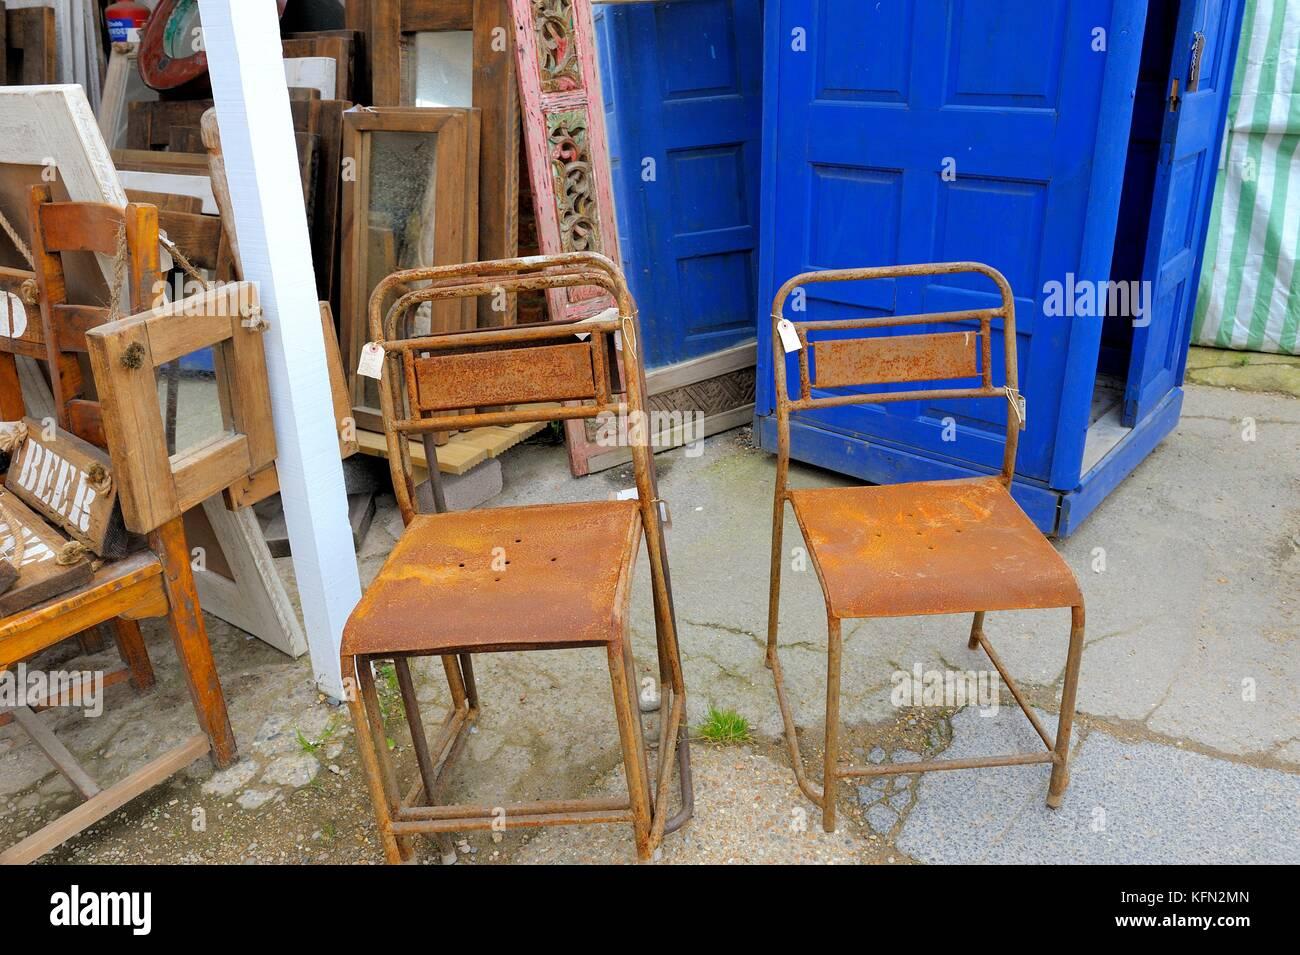 Chairs Outdoor Sale Stockfotos & Chairs Outdoor Sale Bilder - Alamy